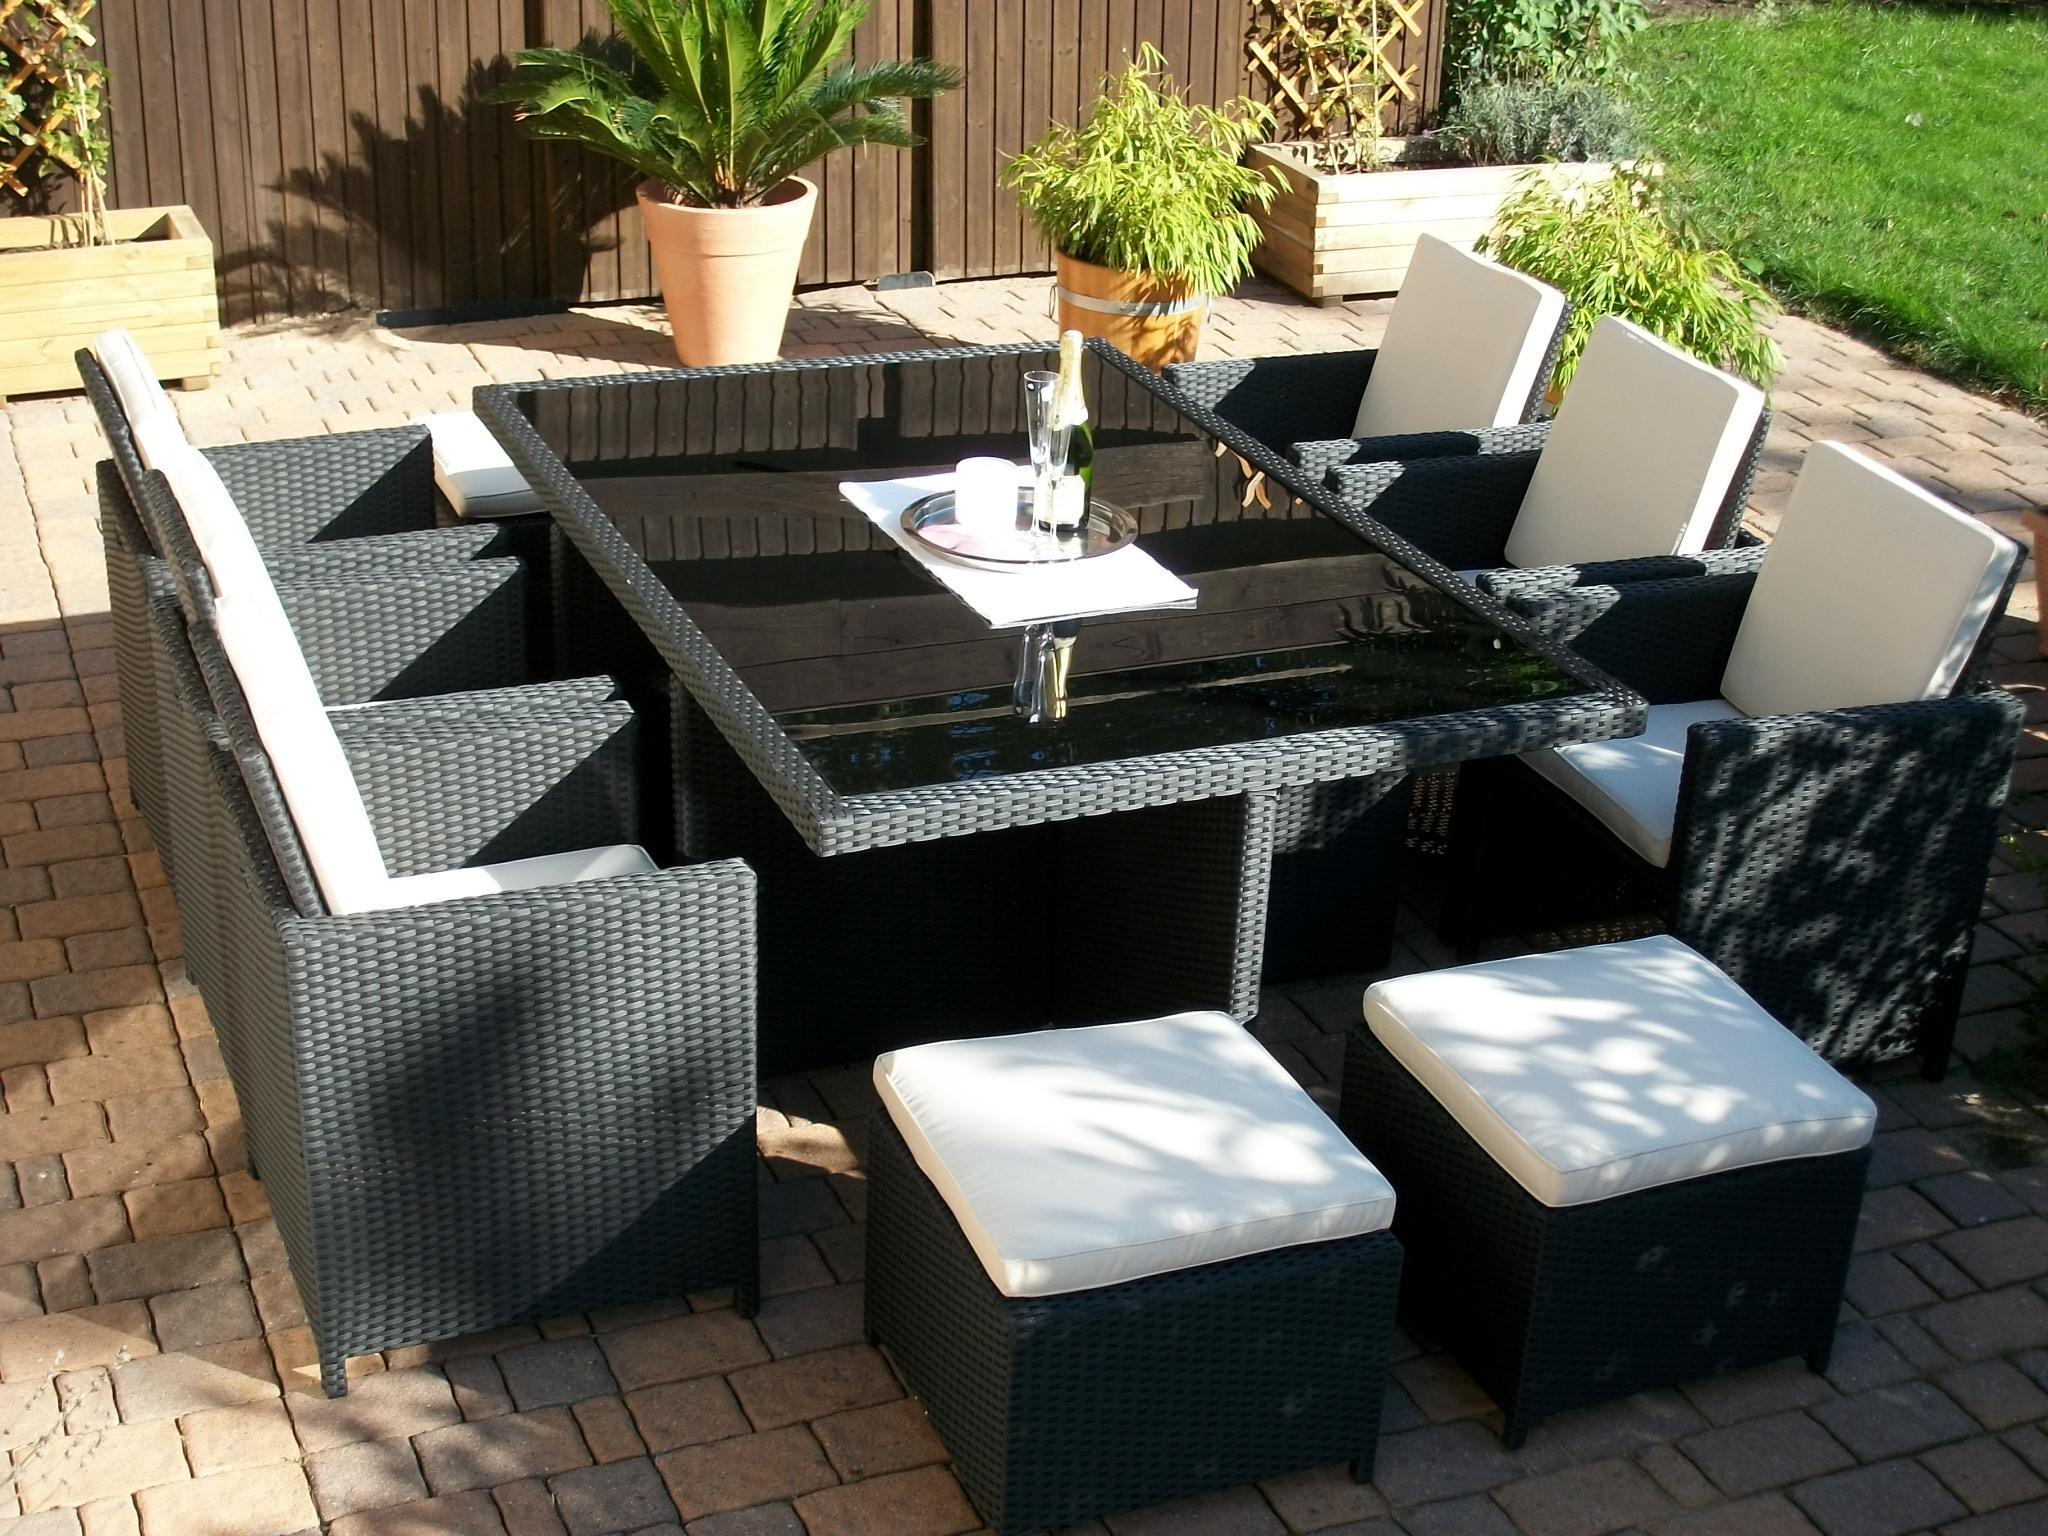 garnitur toscana xl schwarz bomey handel gbr. Black Bedroom Furniture Sets. Home Design Ideas